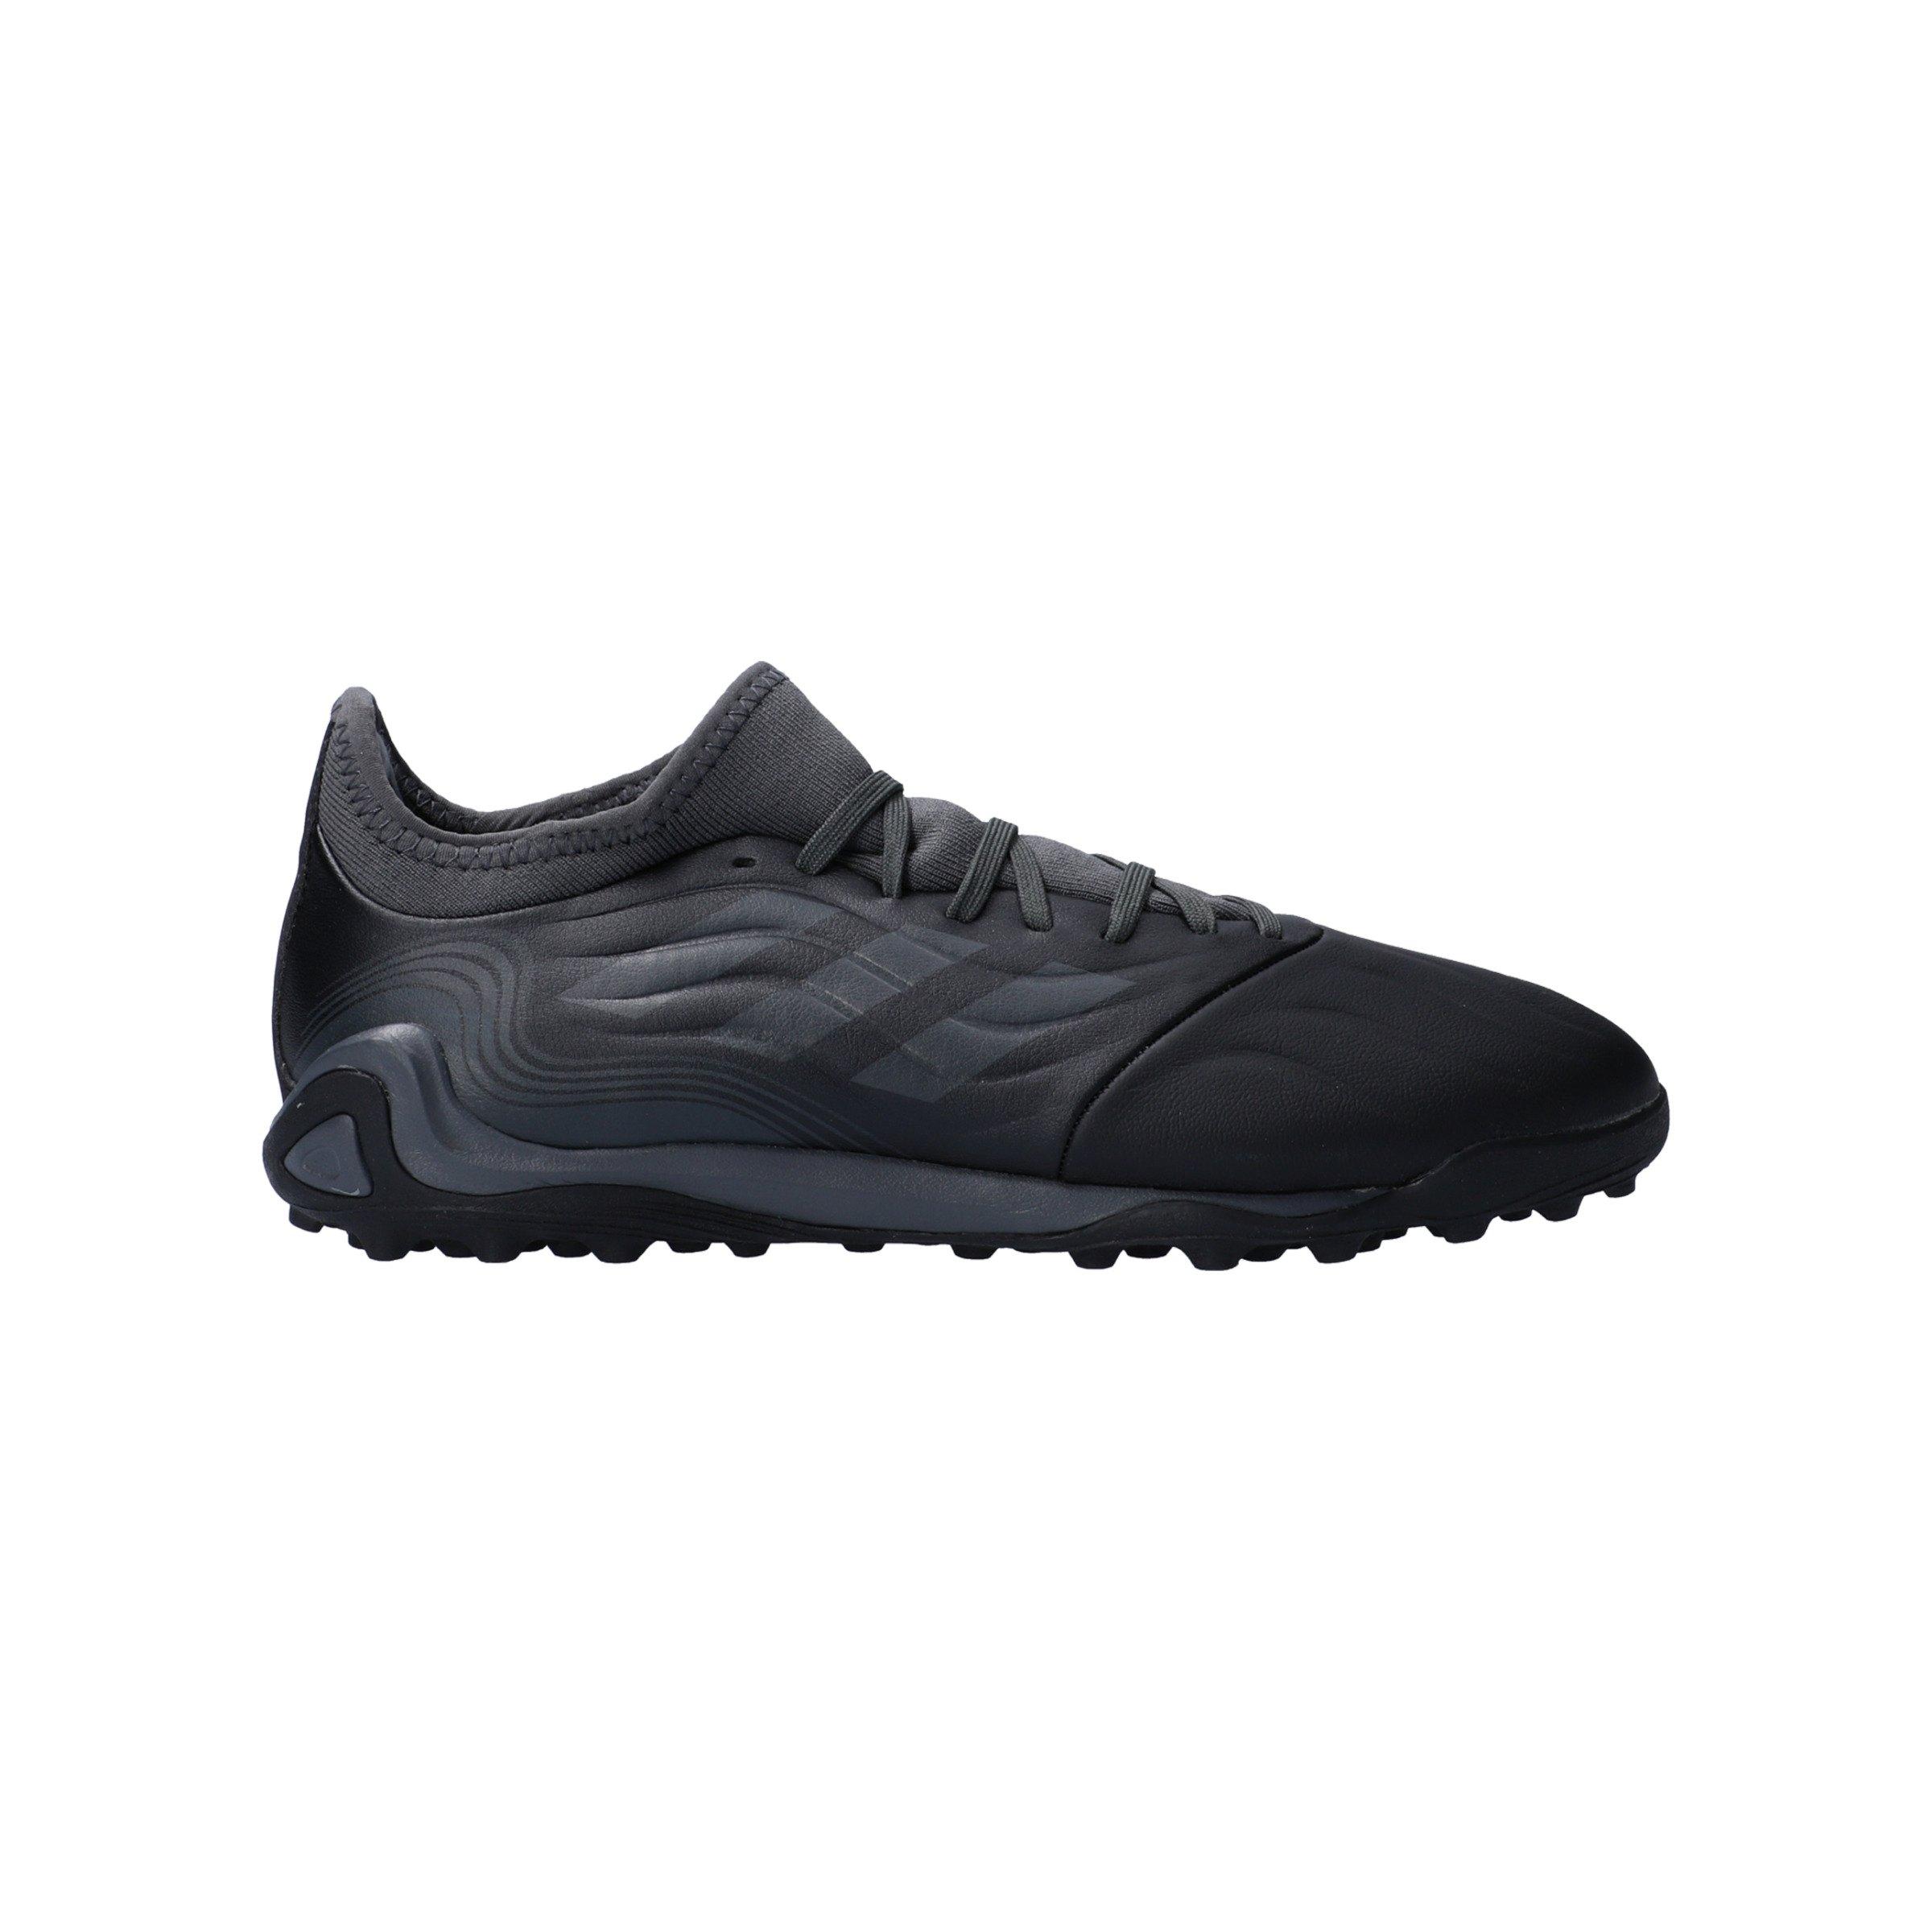 adidas COPA SENSE.3 TF Schwarz Grau - schwarz